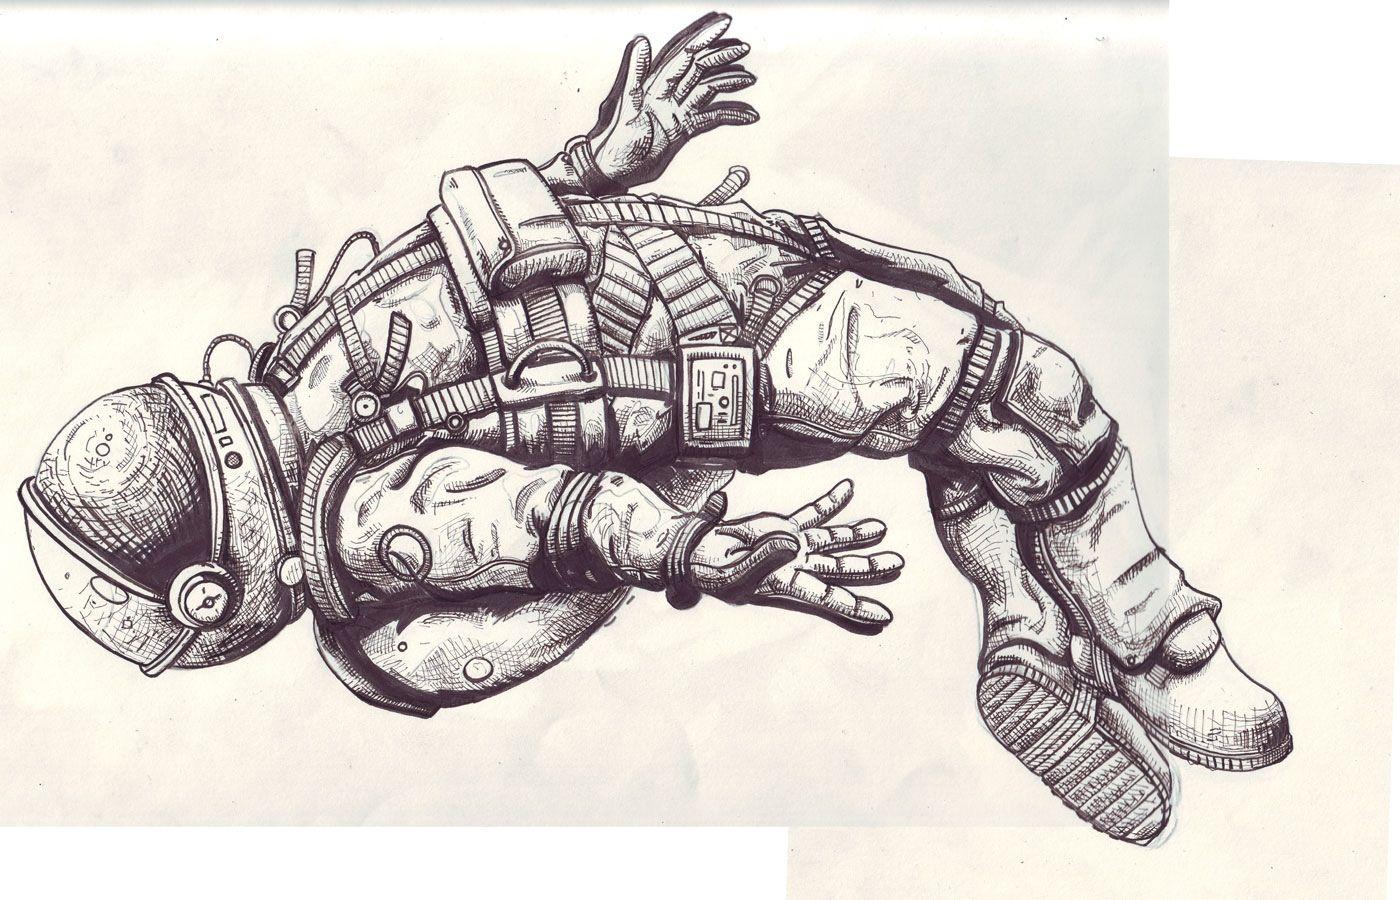 astronaut trippy drawing ideas - photo #34